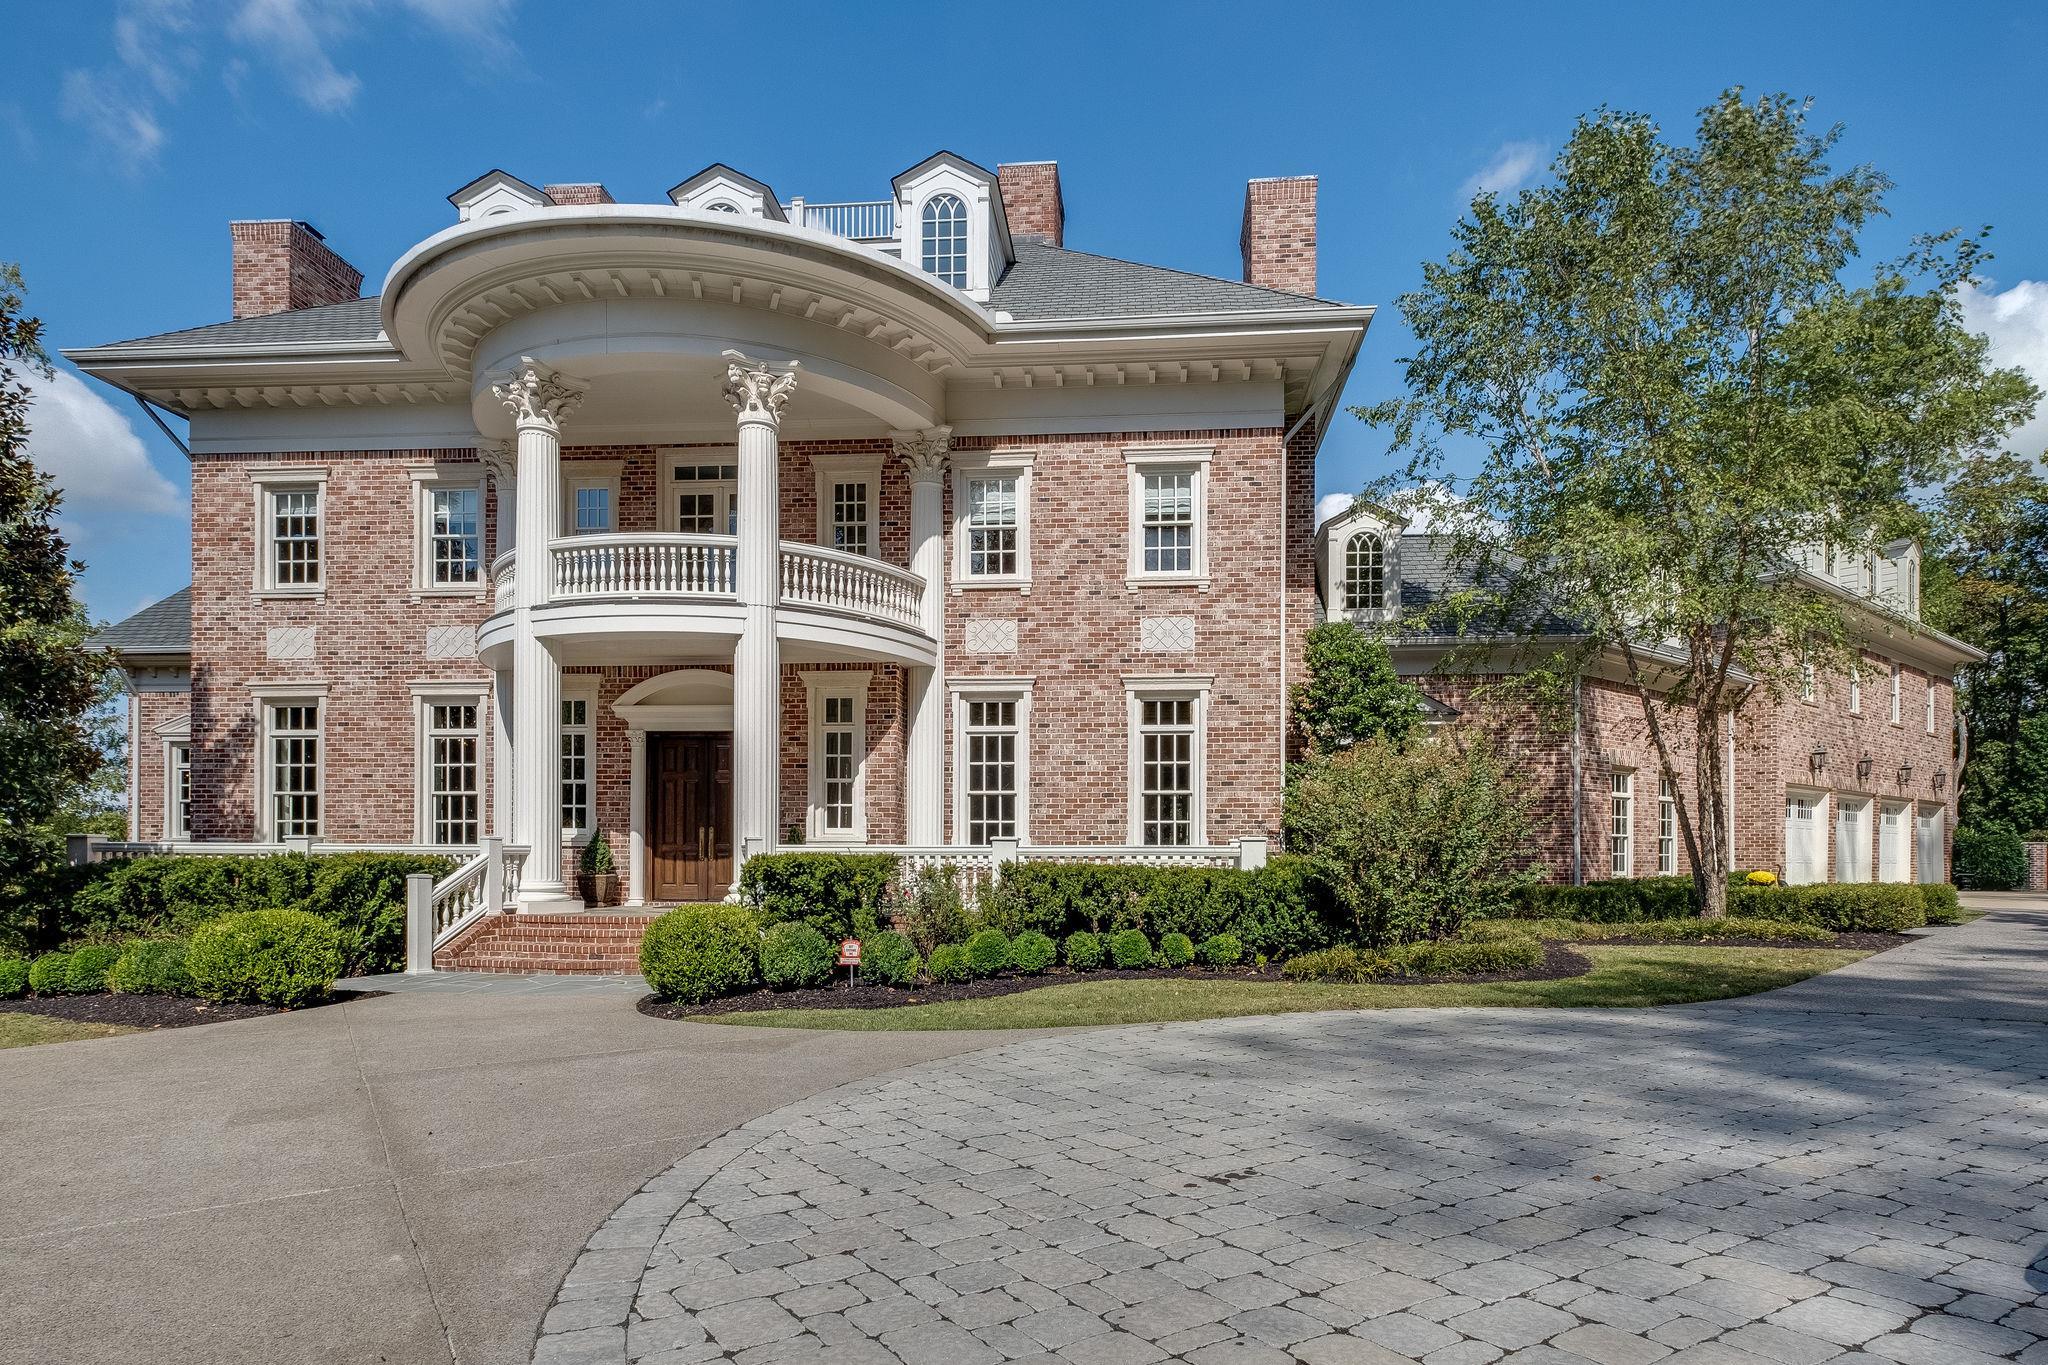 1640 Whispering Hills Drive, Franklin, TN 37069 - Franklin, TN real estate listing